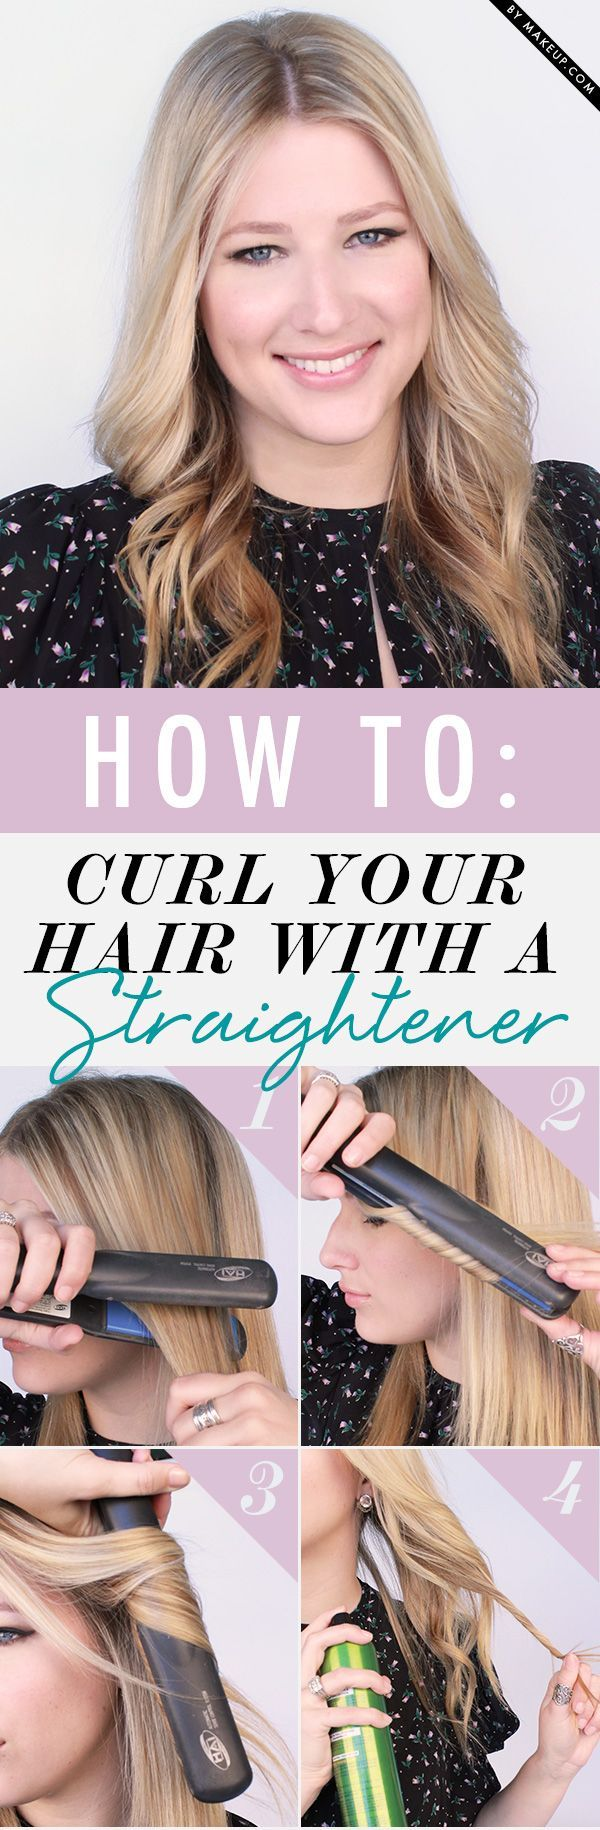 18 Hair Hacks, Tips and Tricks To Make Your Life Easier | Gurl.com